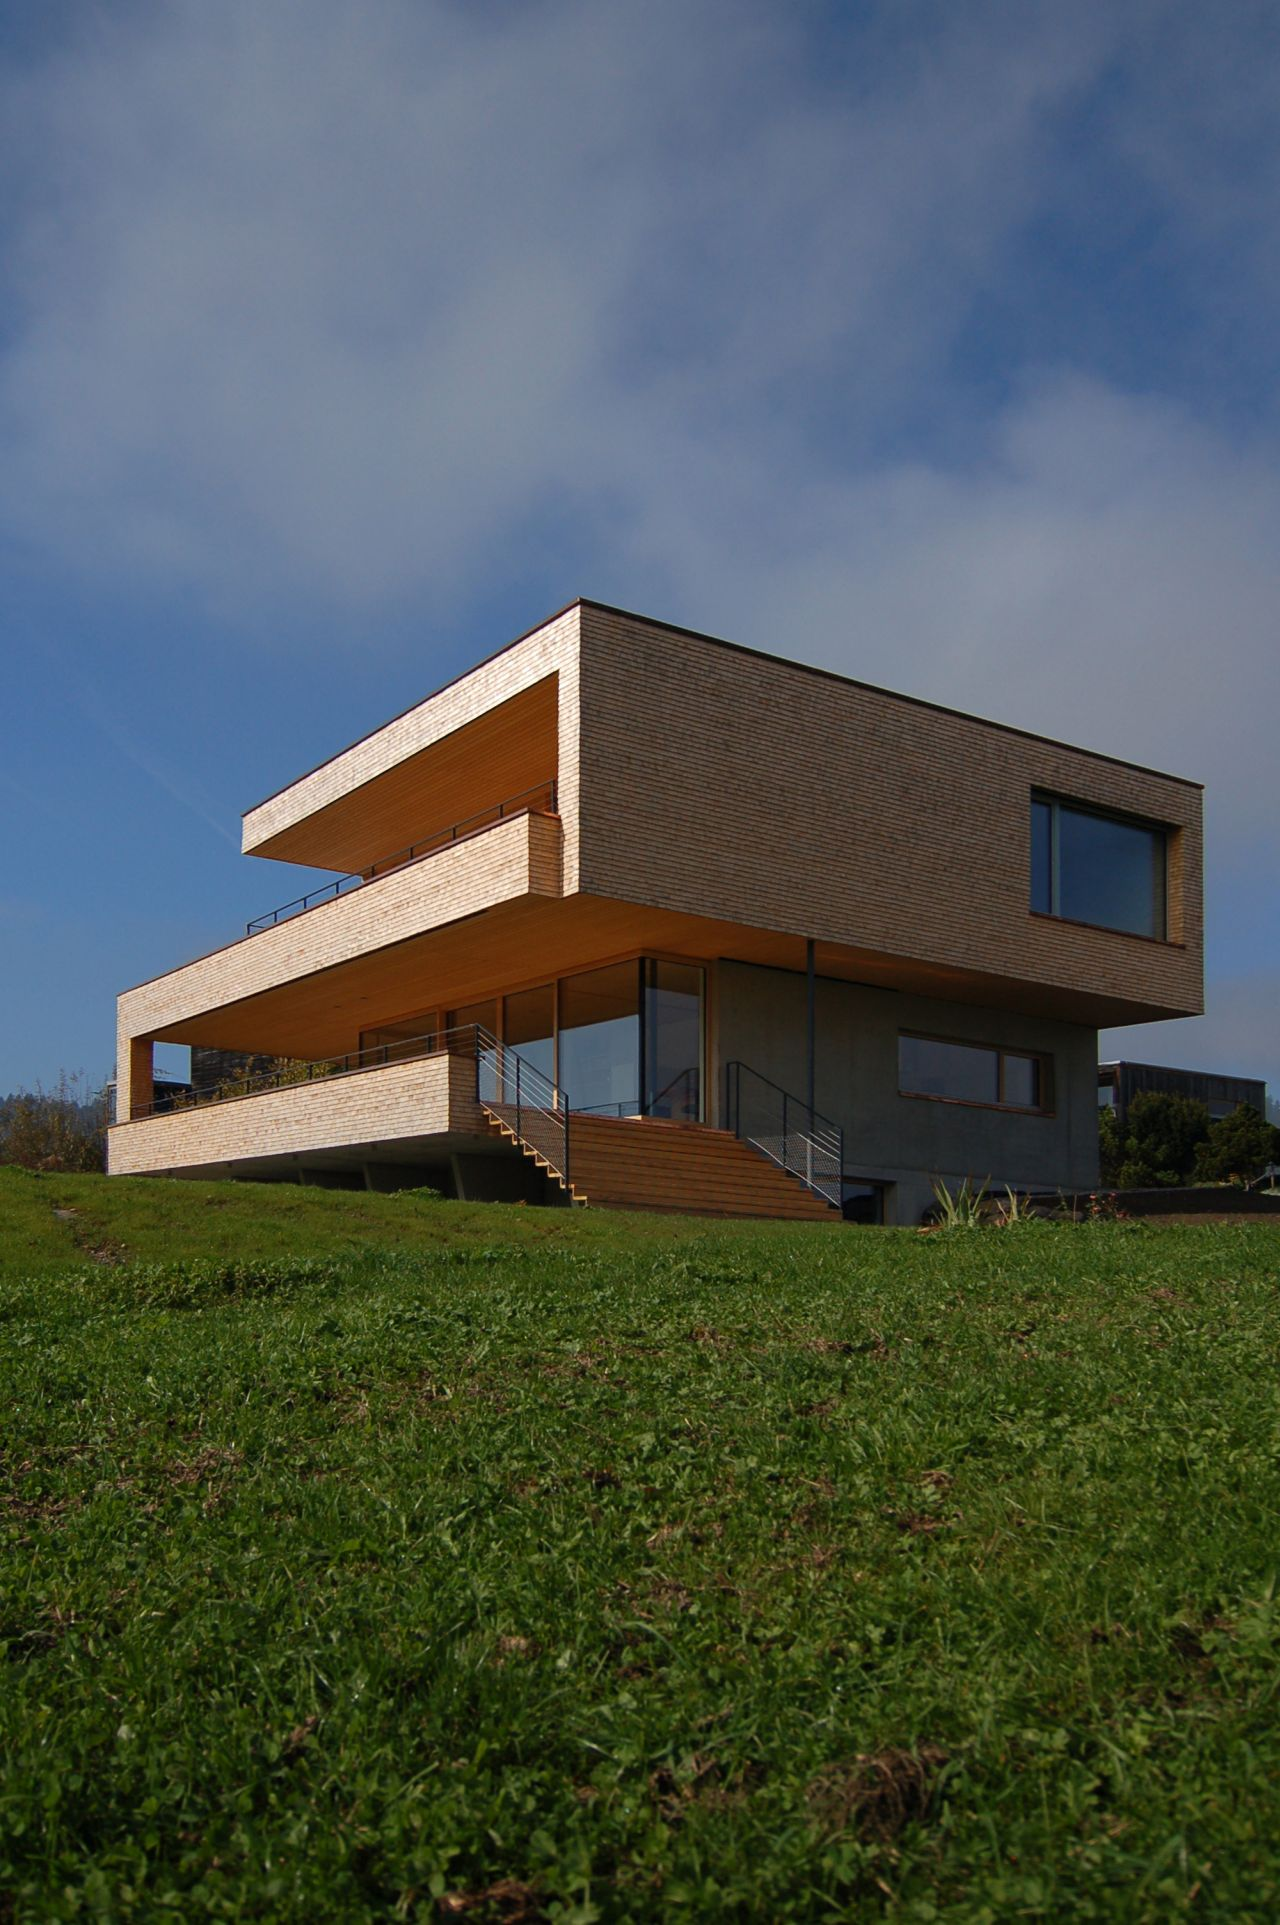 House_alberschwende / k_m architektur, Courtesy of k_m architektur